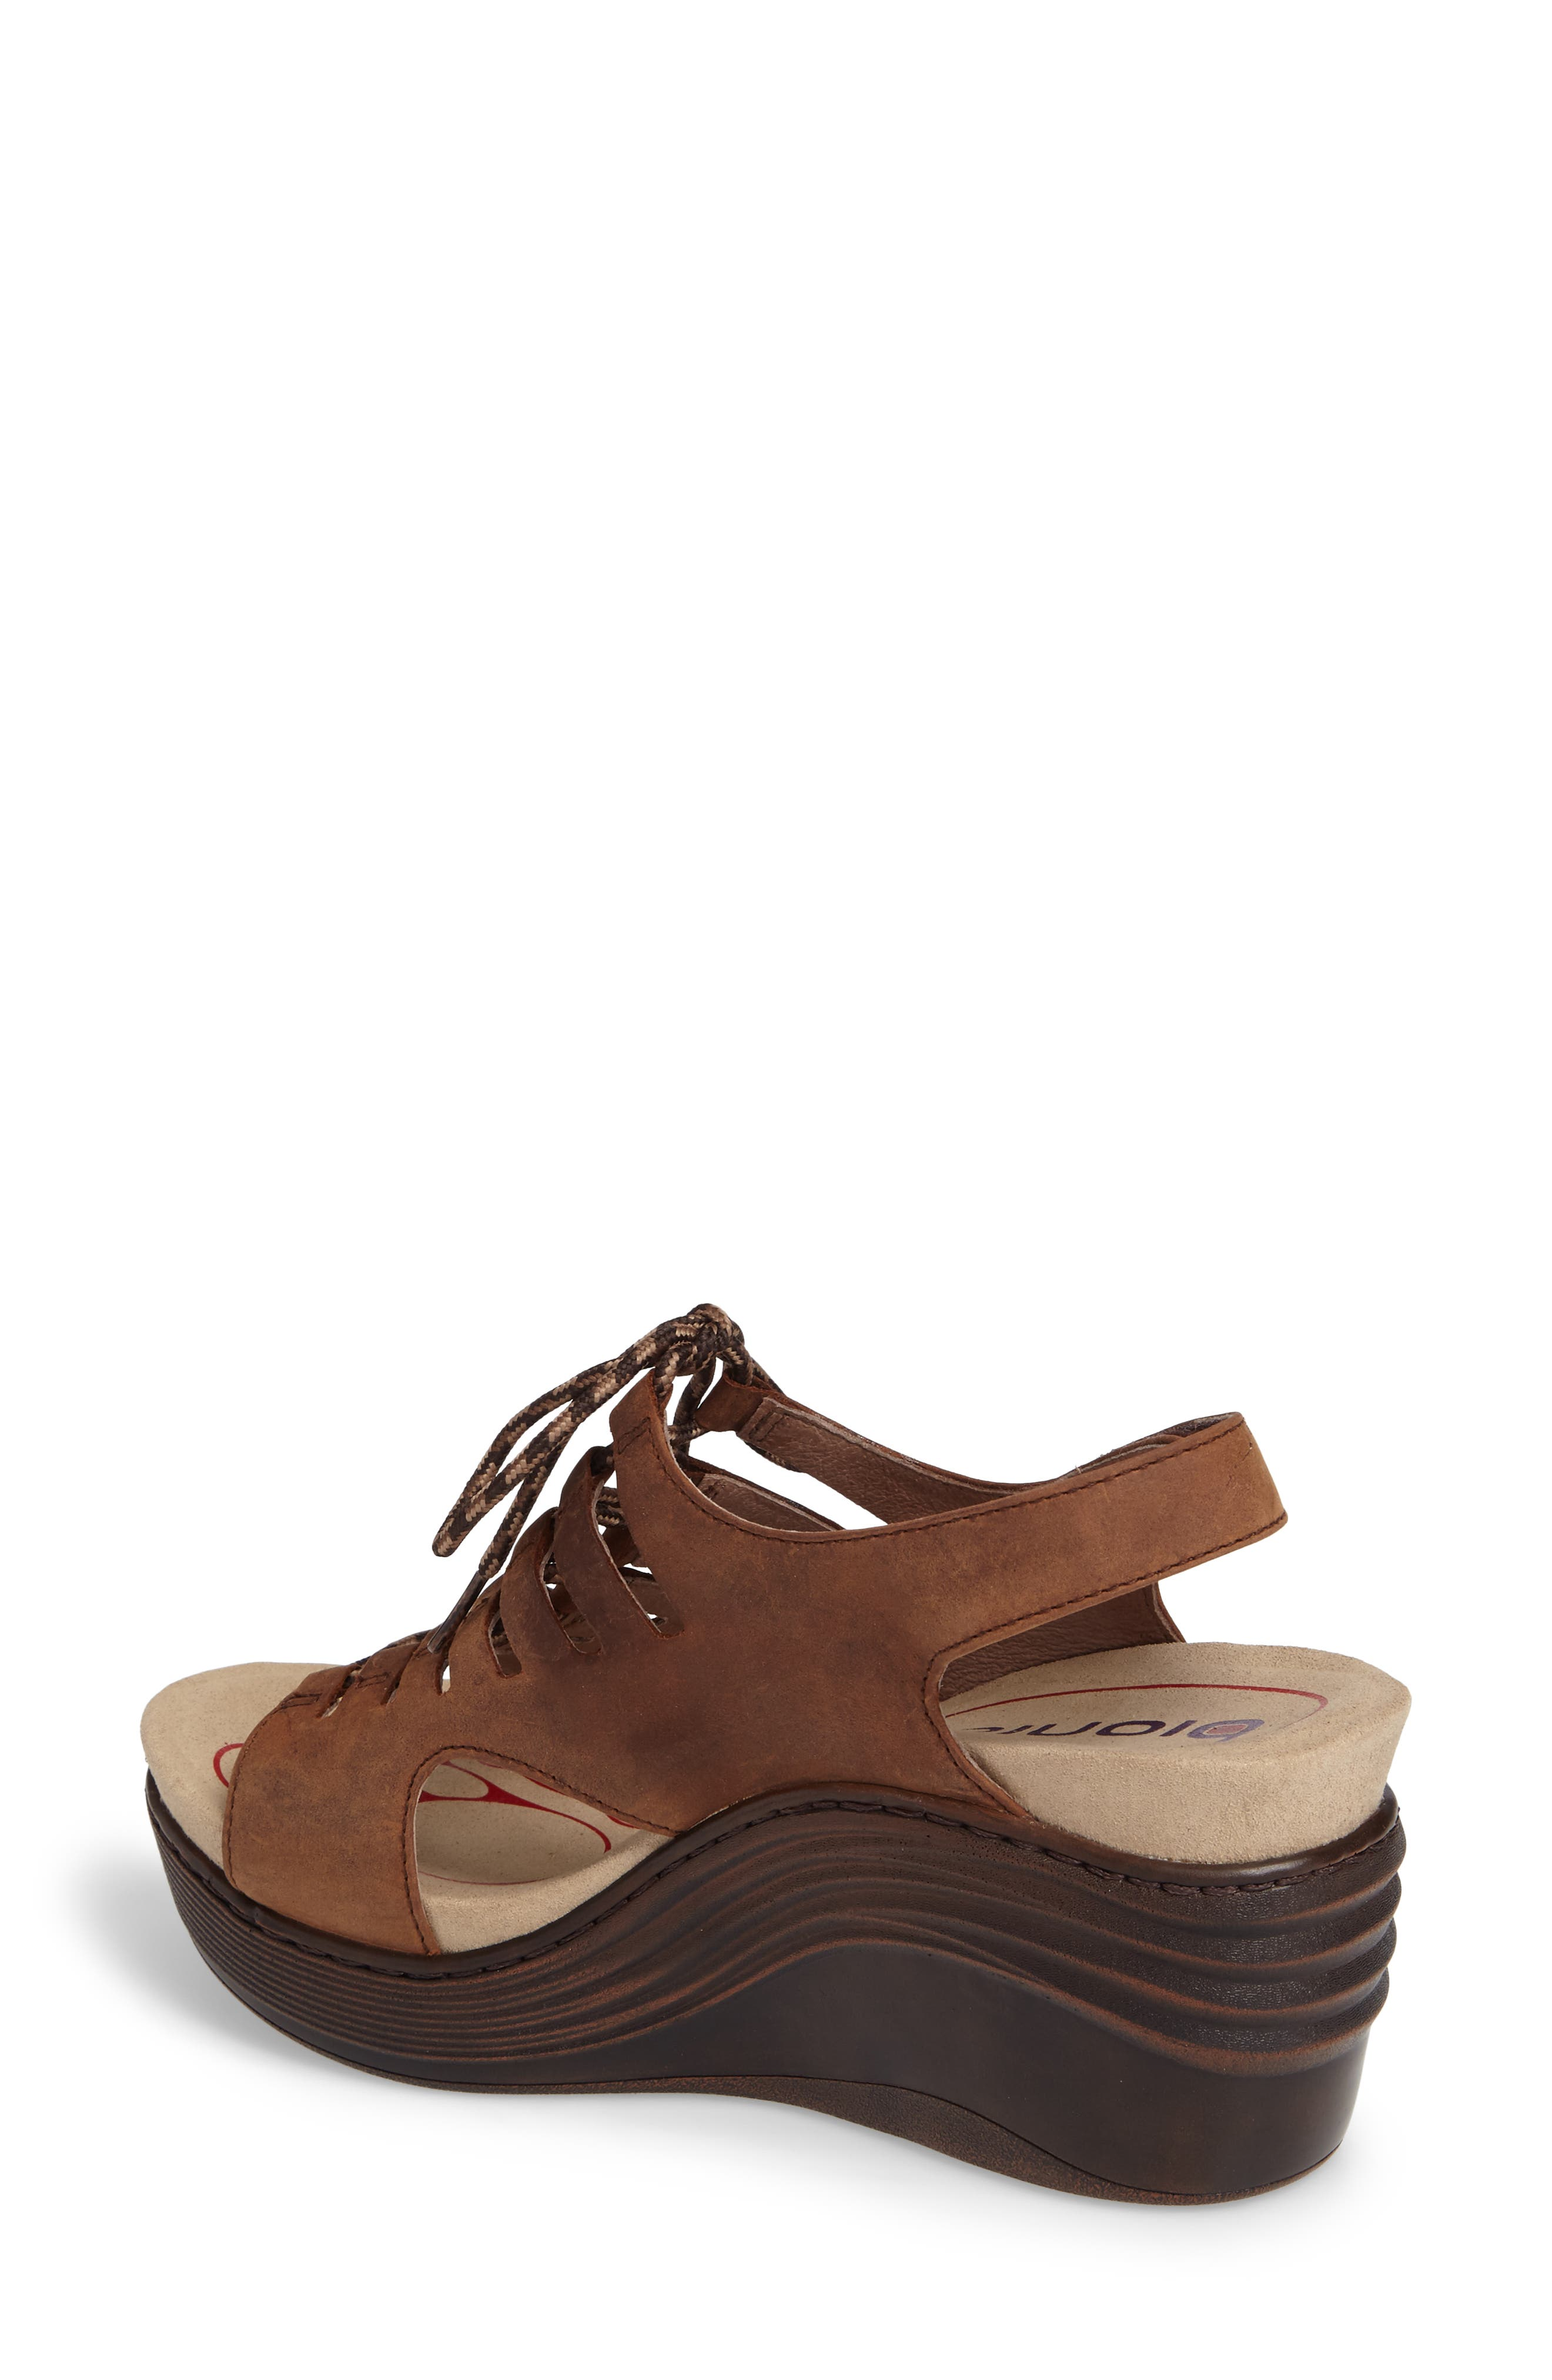 Alternate Image 2  - BIONICA Sirus Wedge Sandal (Women)